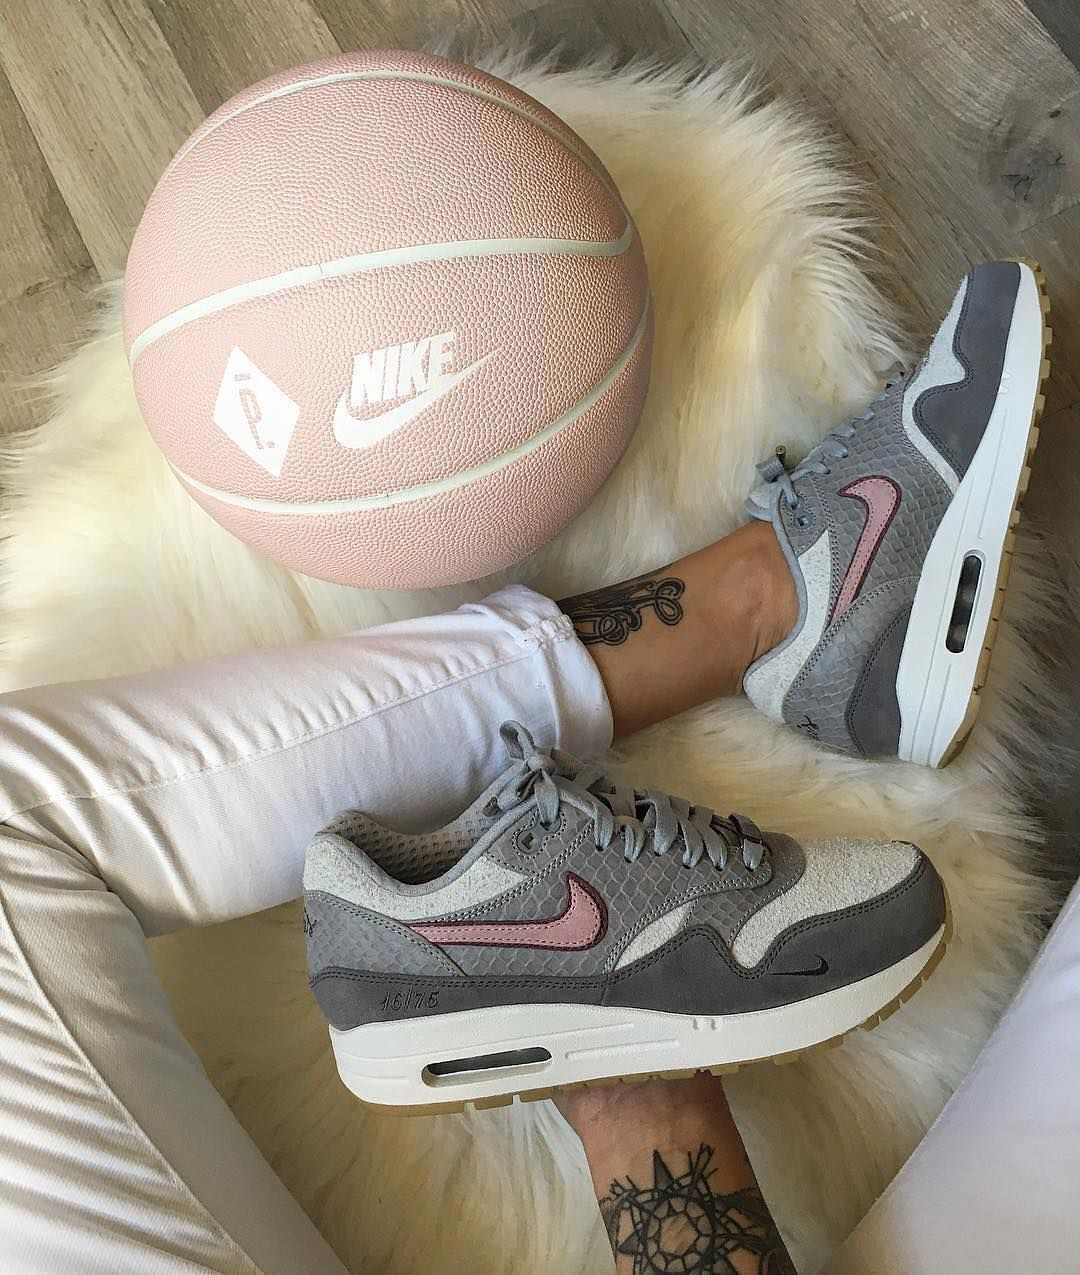 footwear outlet store uk cheap sale Nike Air Max 1 x Paris Bespoke @celouuuuuuuu | Nike Air Max ...